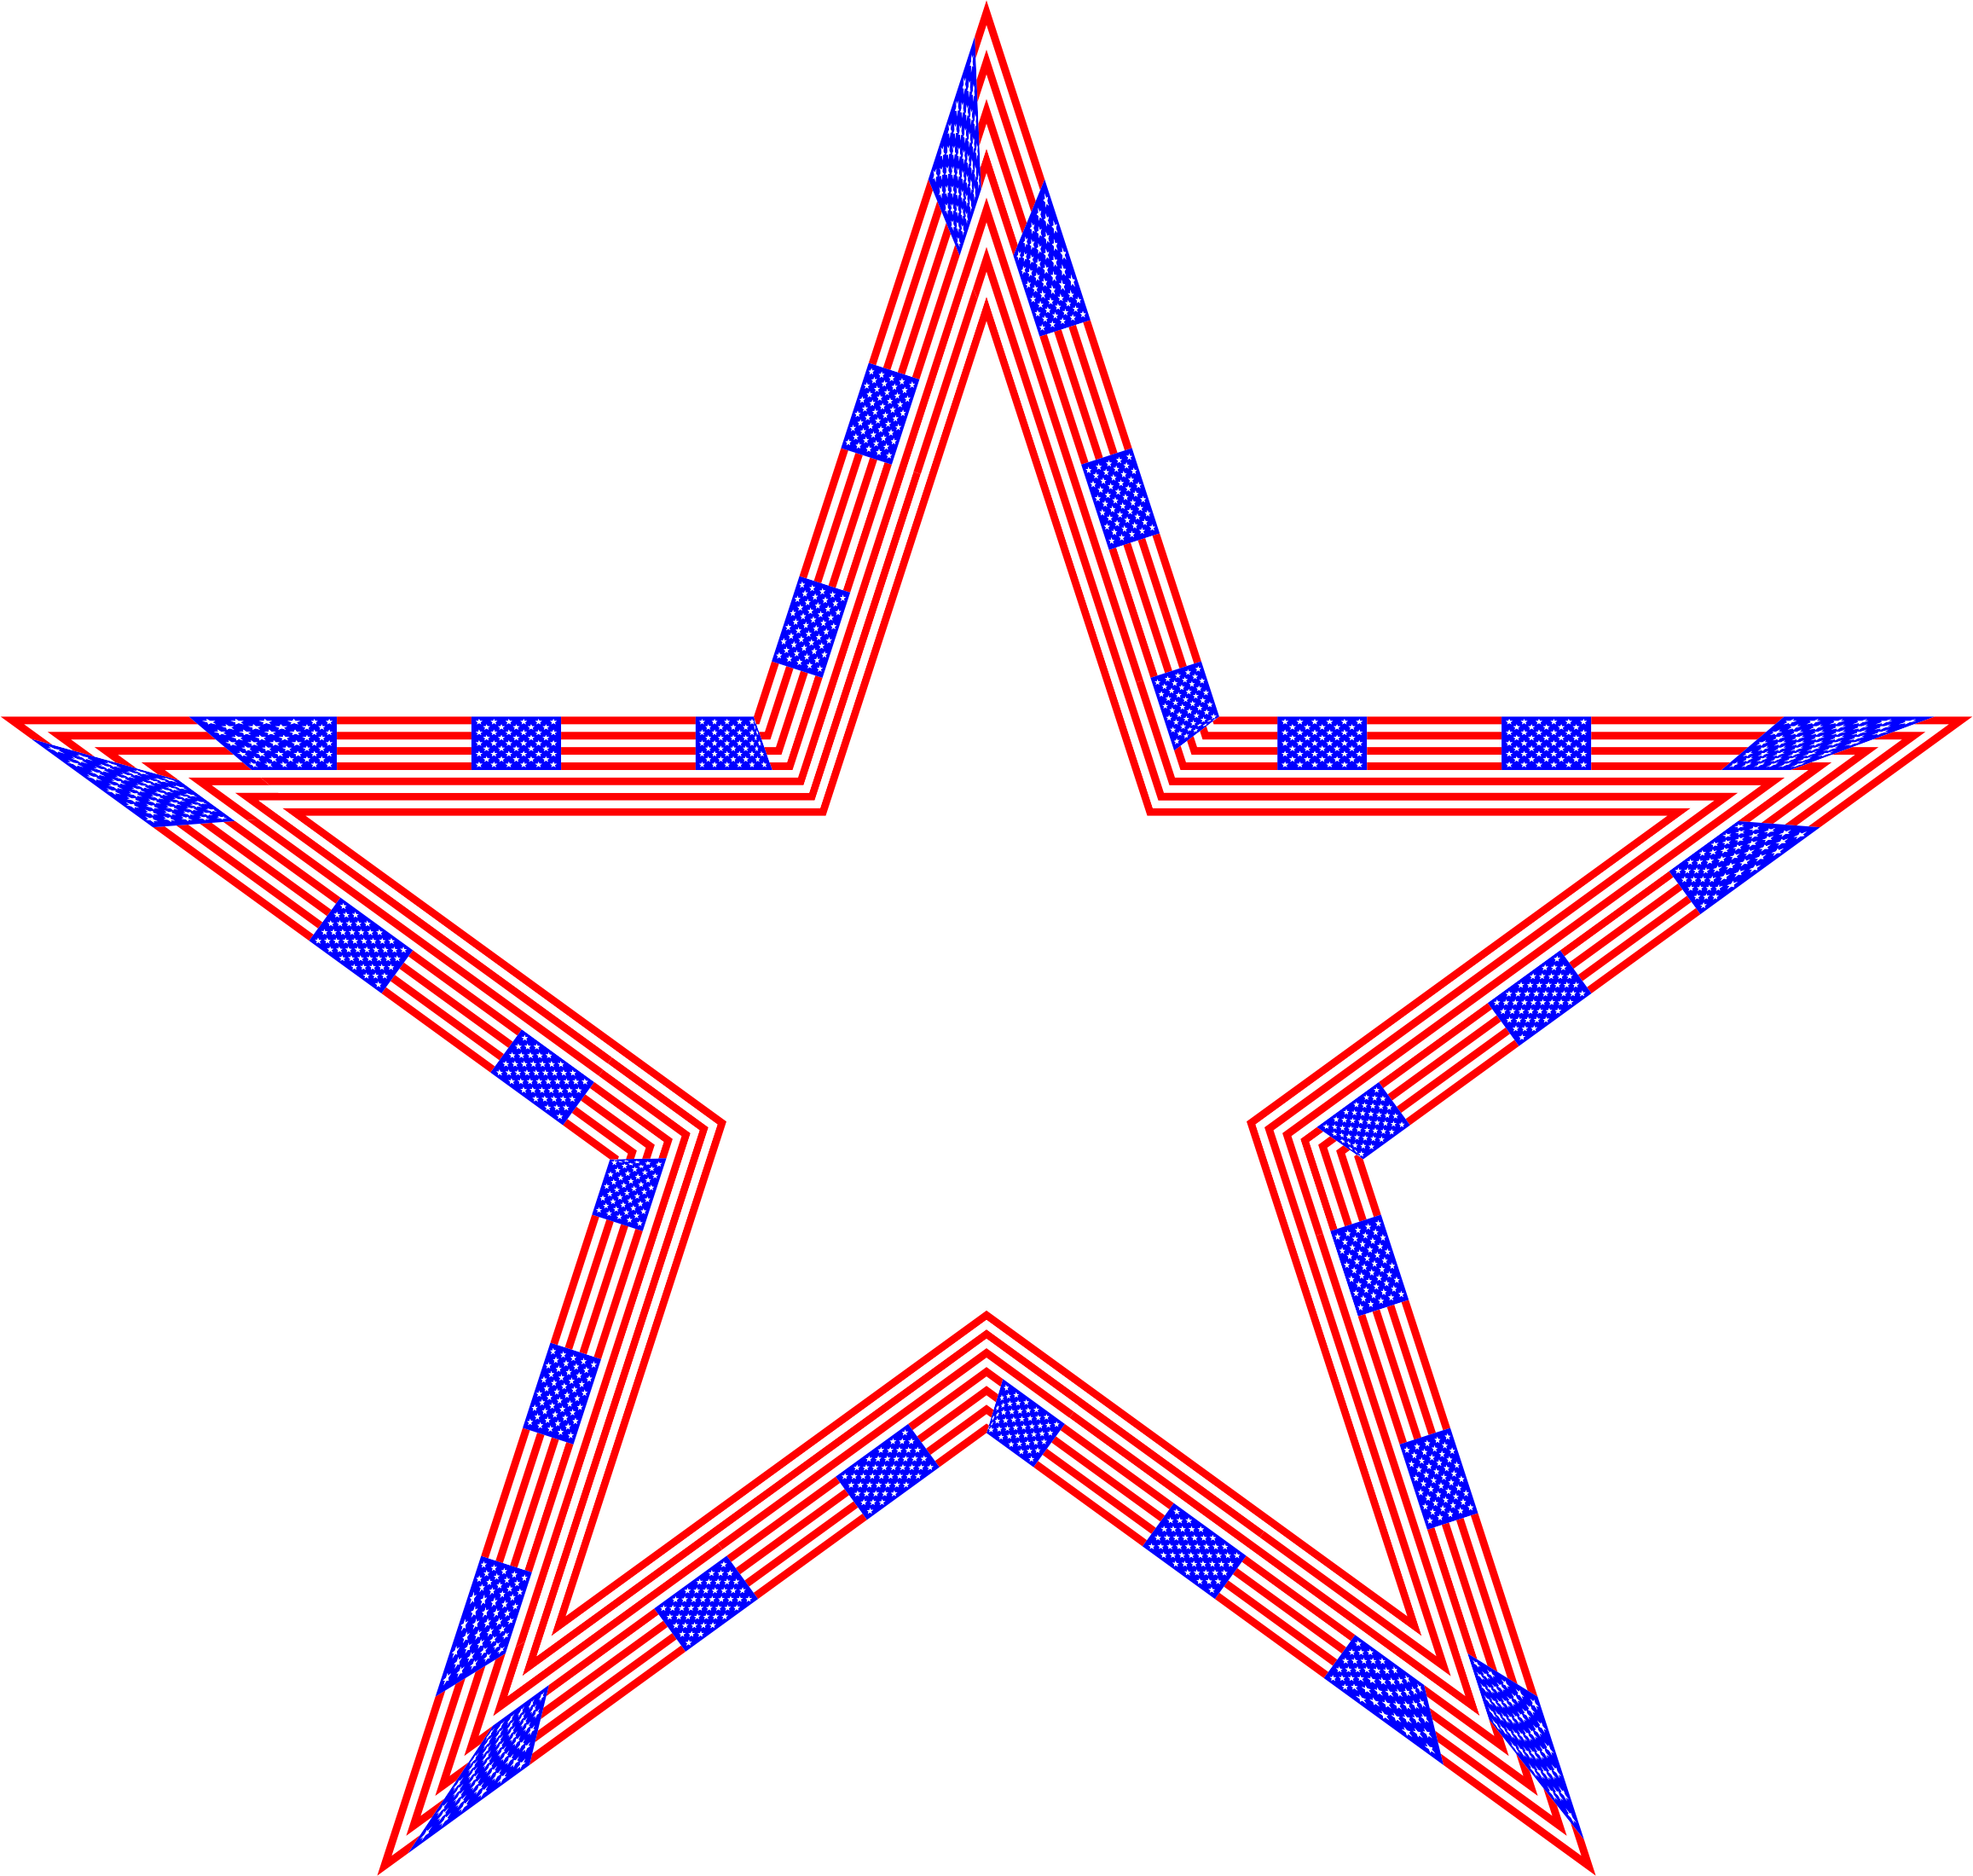 Star flag clipart jpg freeuse Clipart - USA Flag Star jpg freeuse